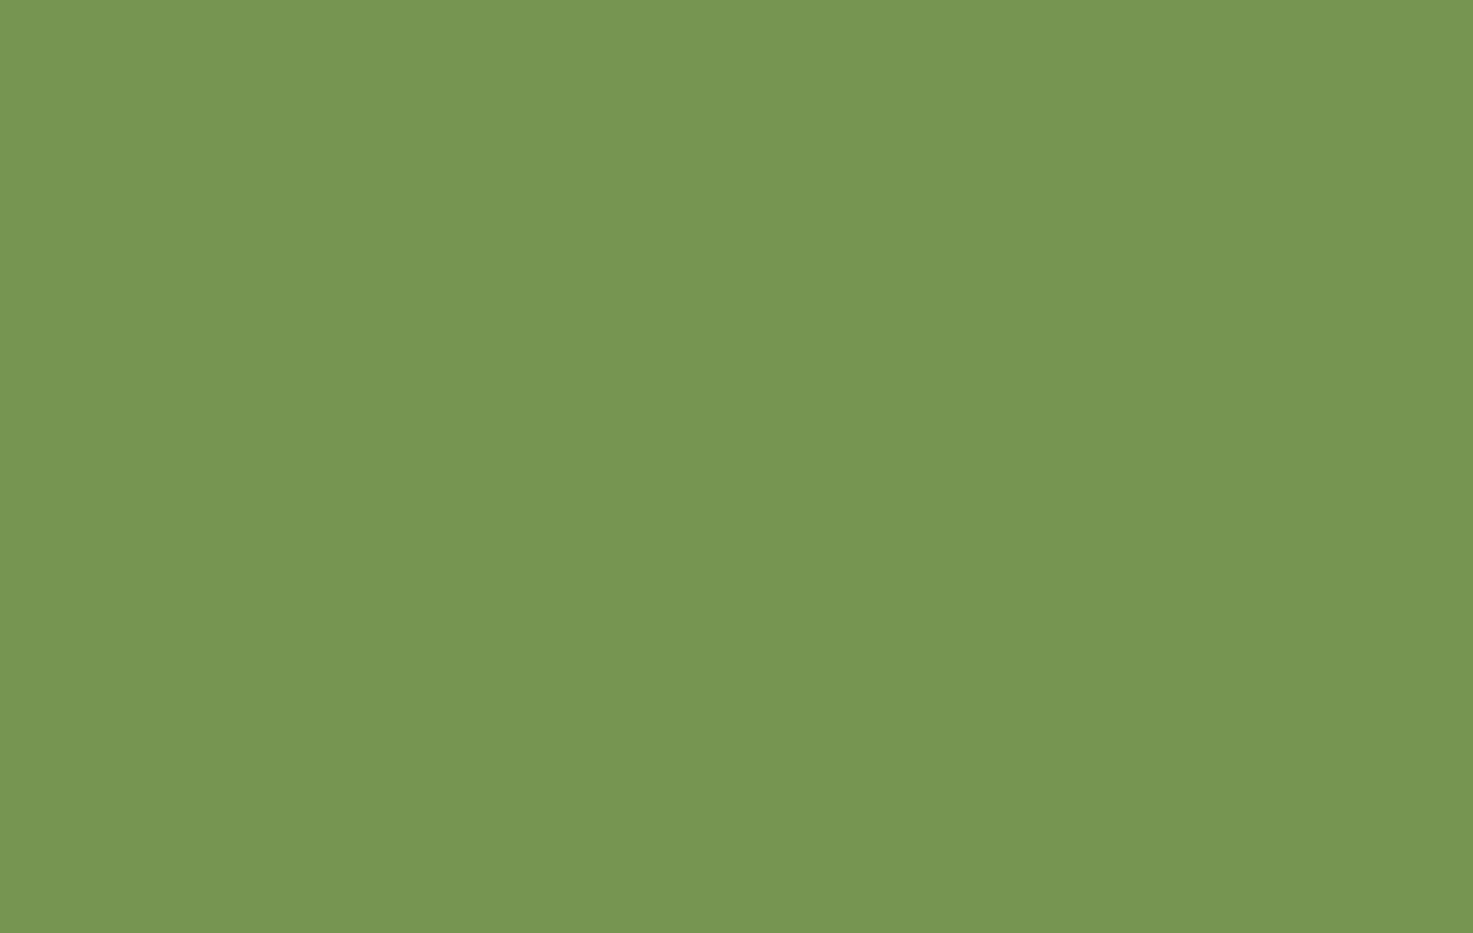 verde prato 528